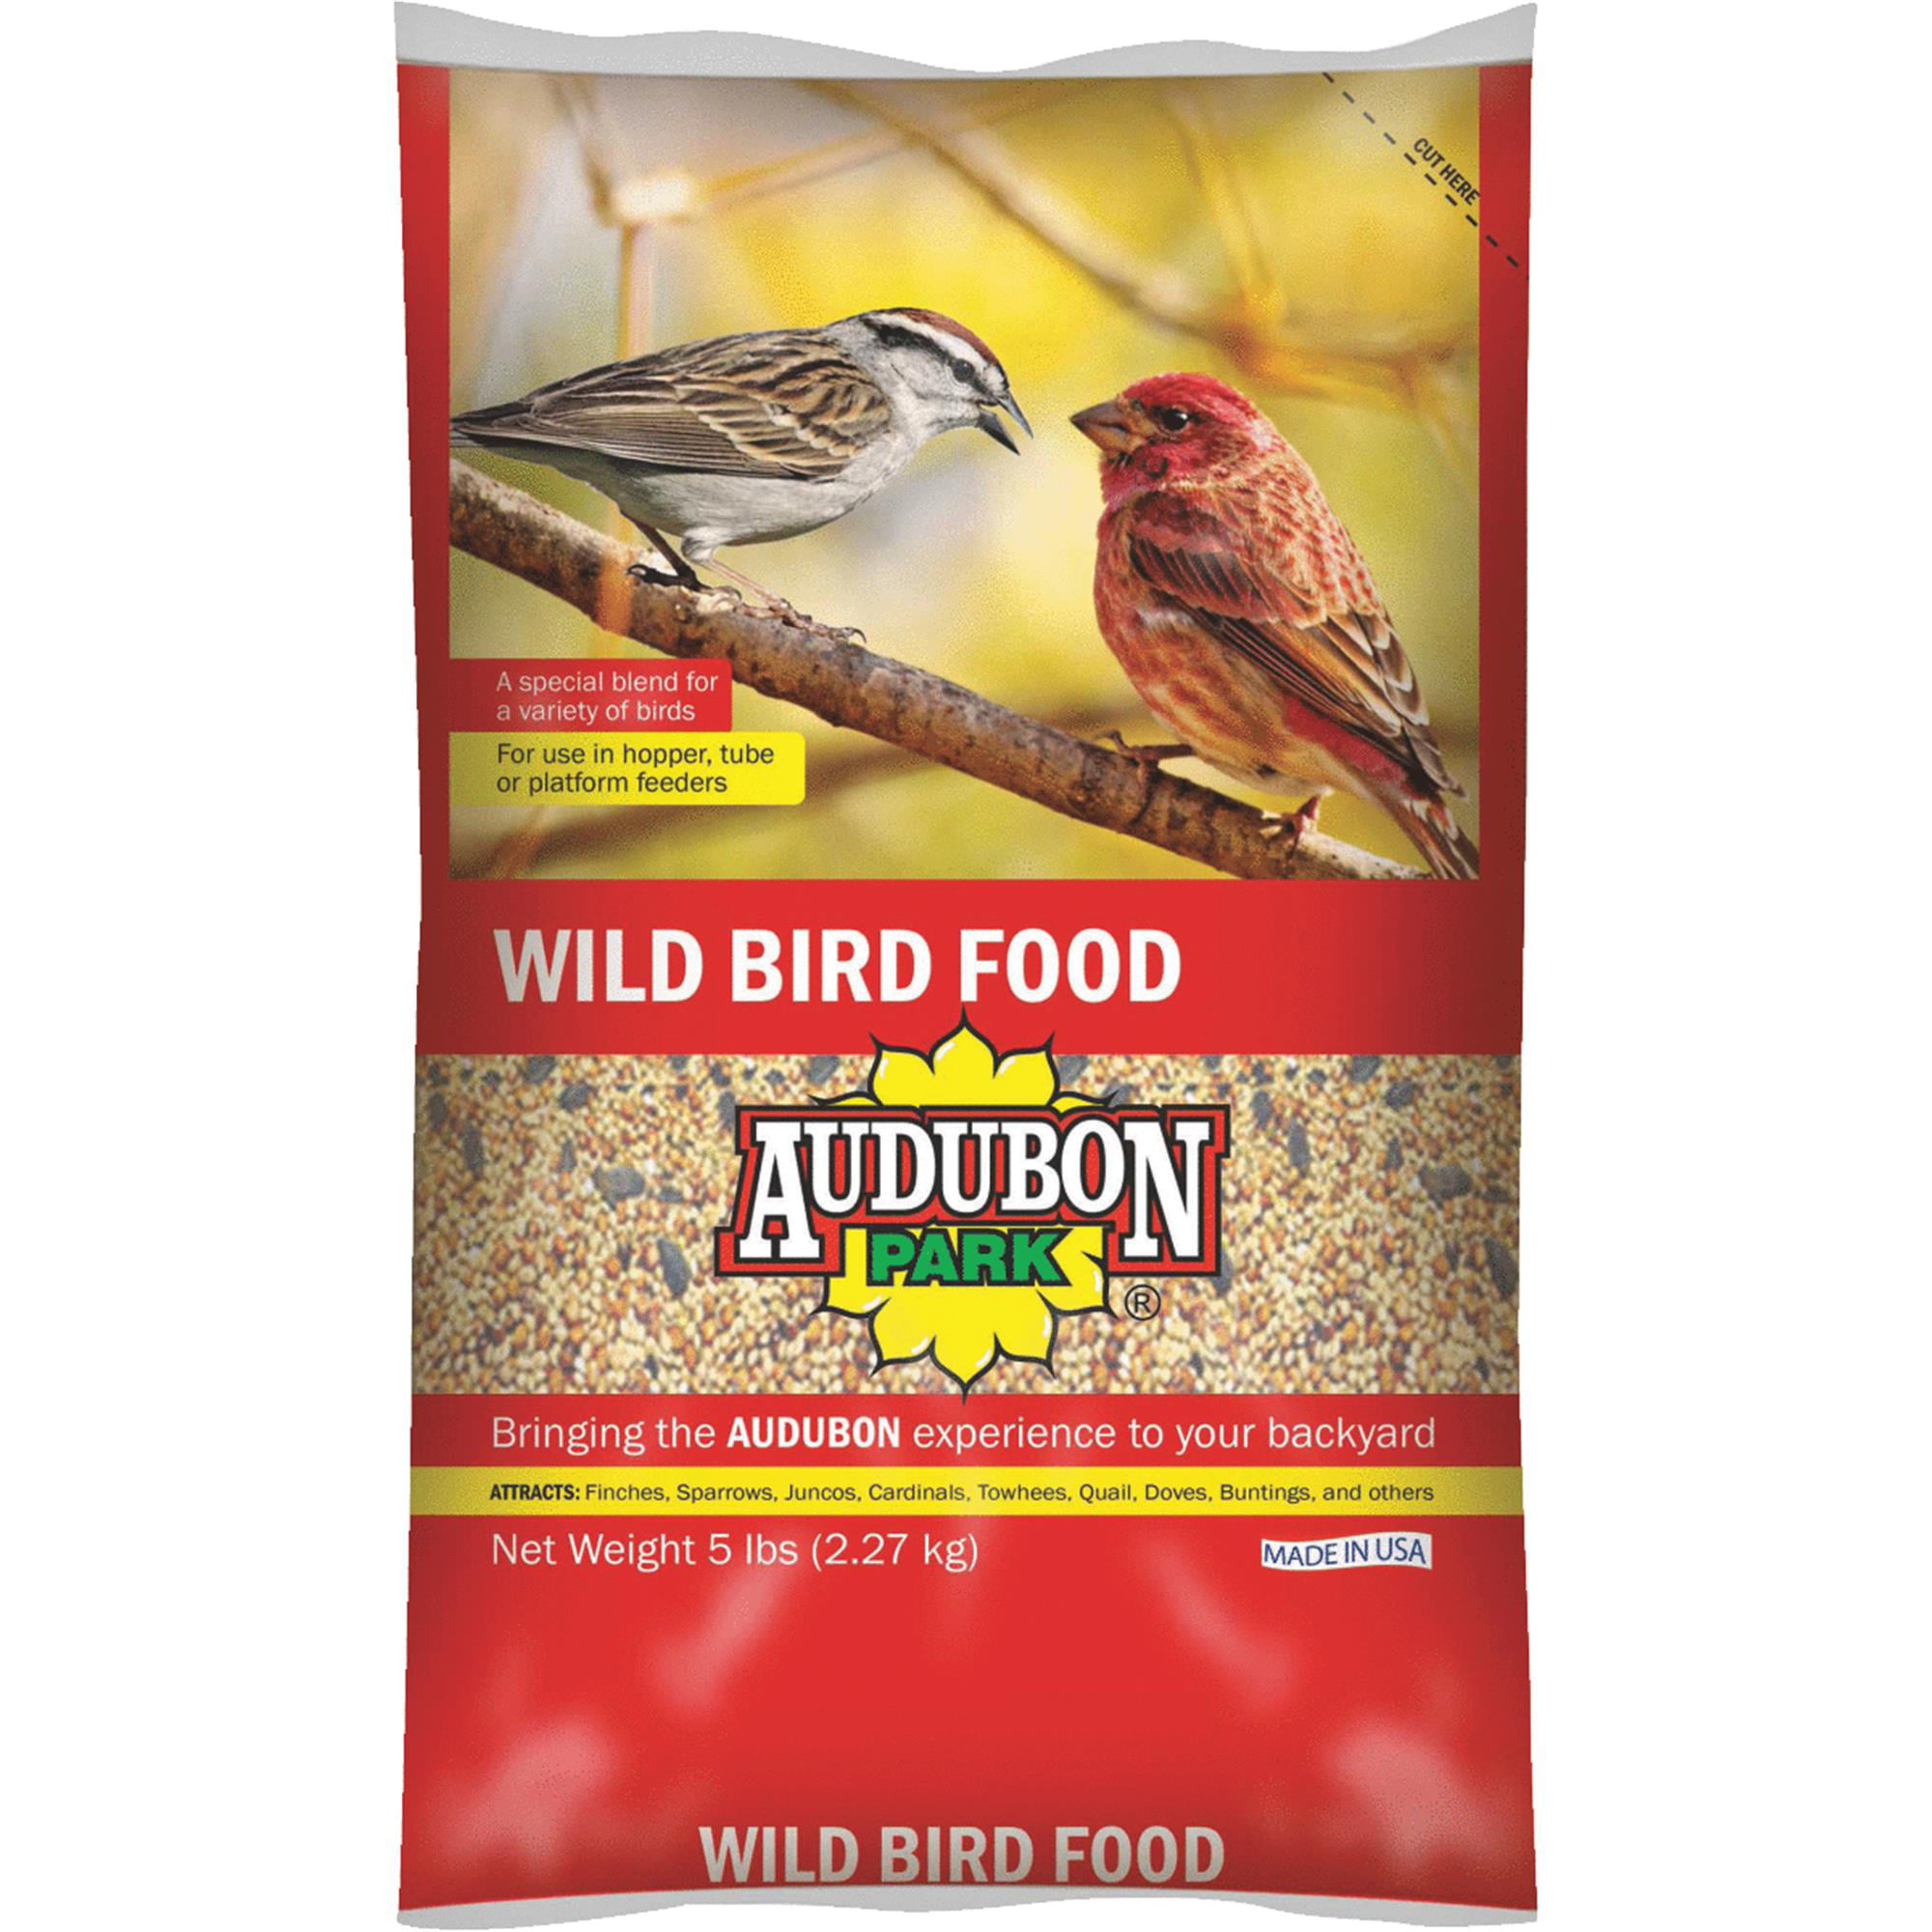 Audubon Park Wild Bird Food by Global Harvest Foods